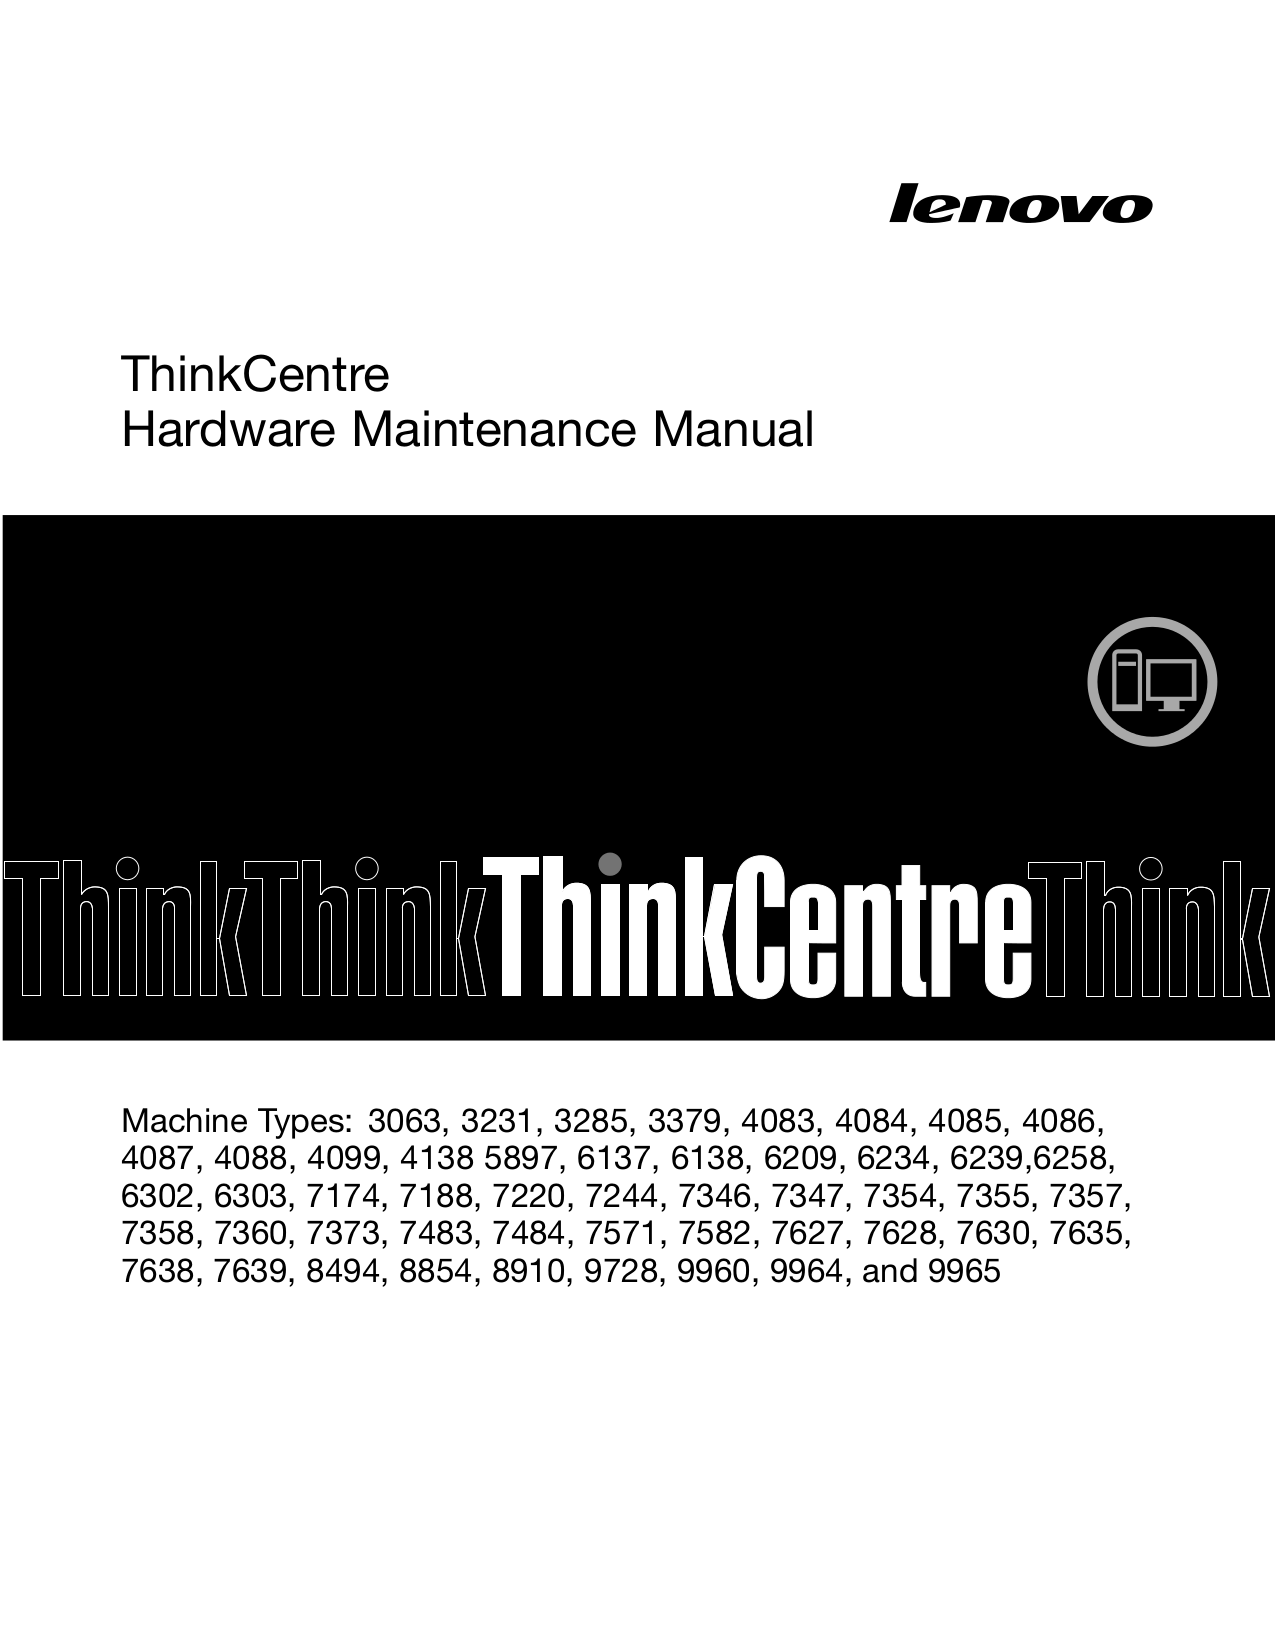 pdf for Lenovo Desktop ThinkCentre M58p 4087 manual